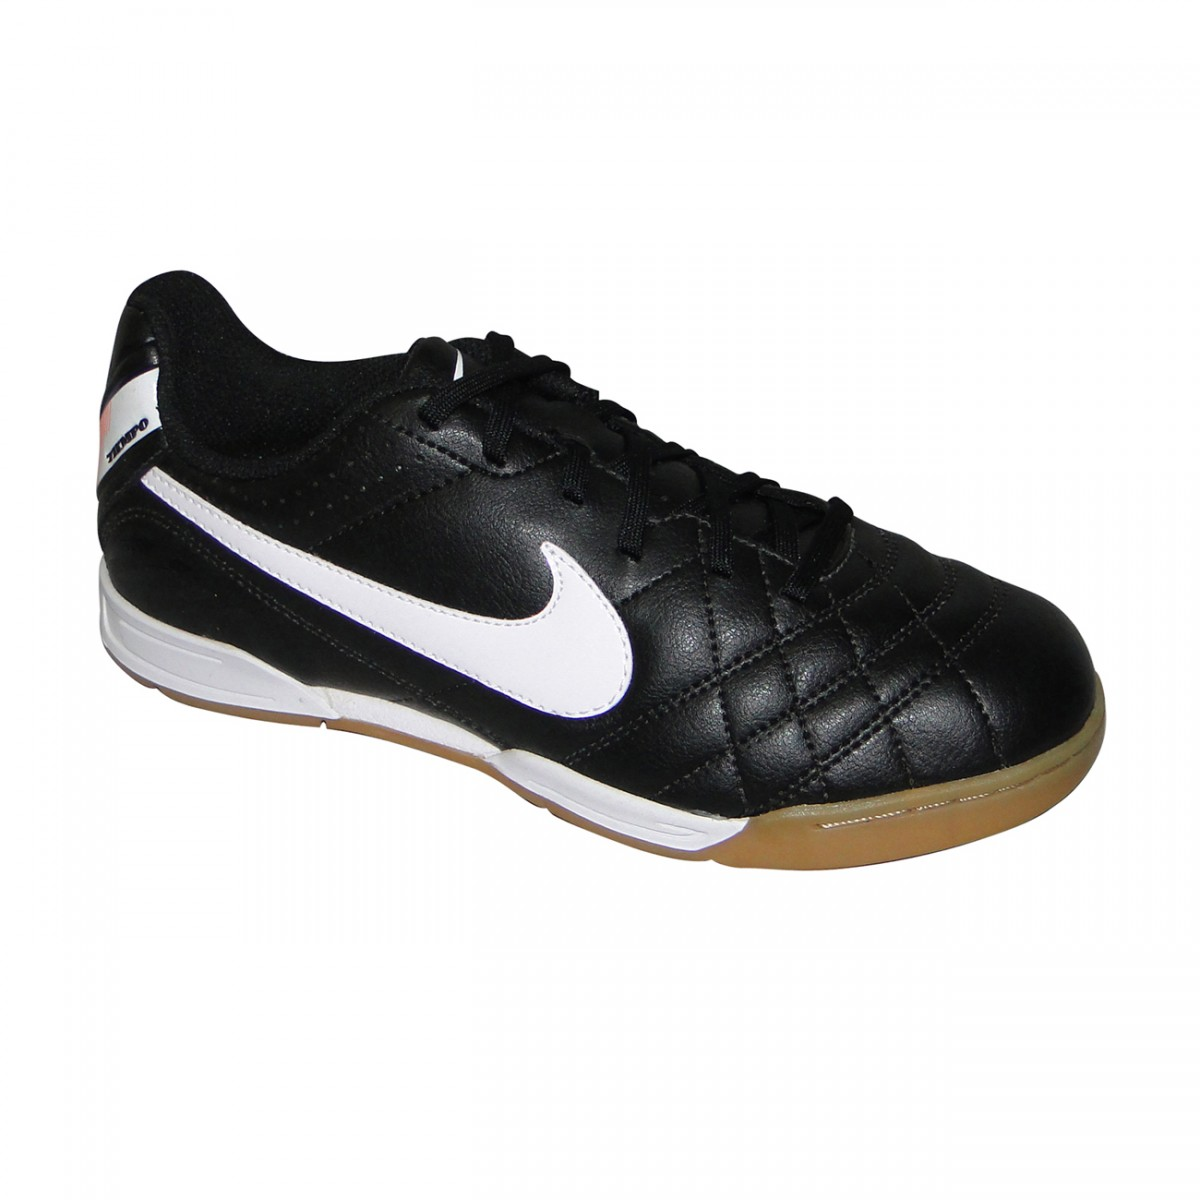 Tênis Nike Tiempo Natural Iv Infantil 9216 - PRETO BRANCO - Chuteira Nike ae7008124e7b1